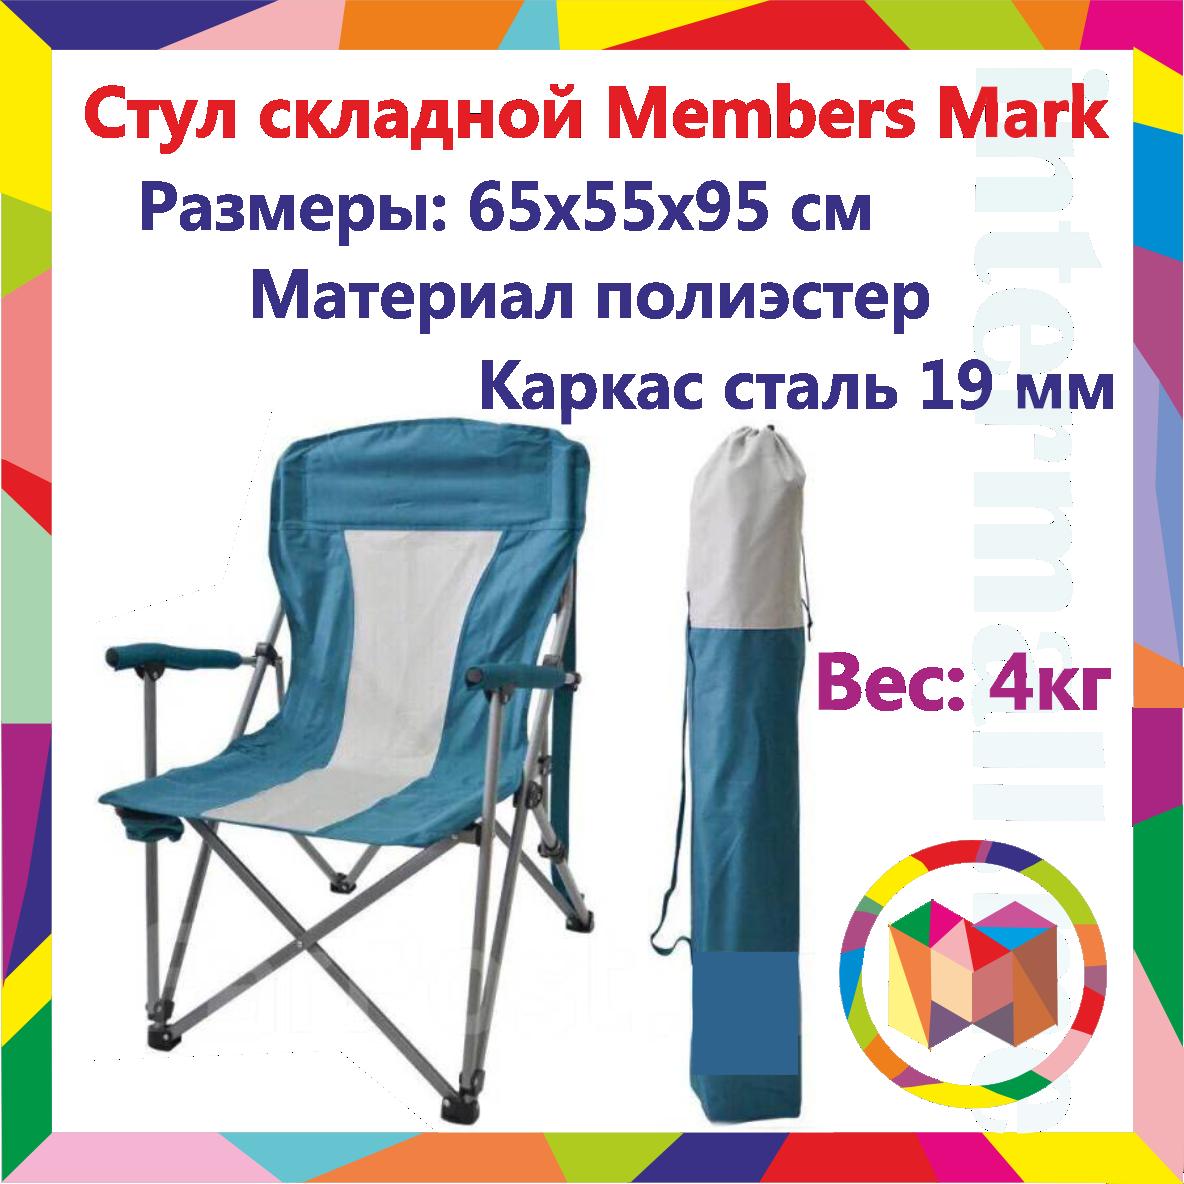 Стул складной для пикника, с металлическим каркасом, стул Member's Mark, 53х42х74см